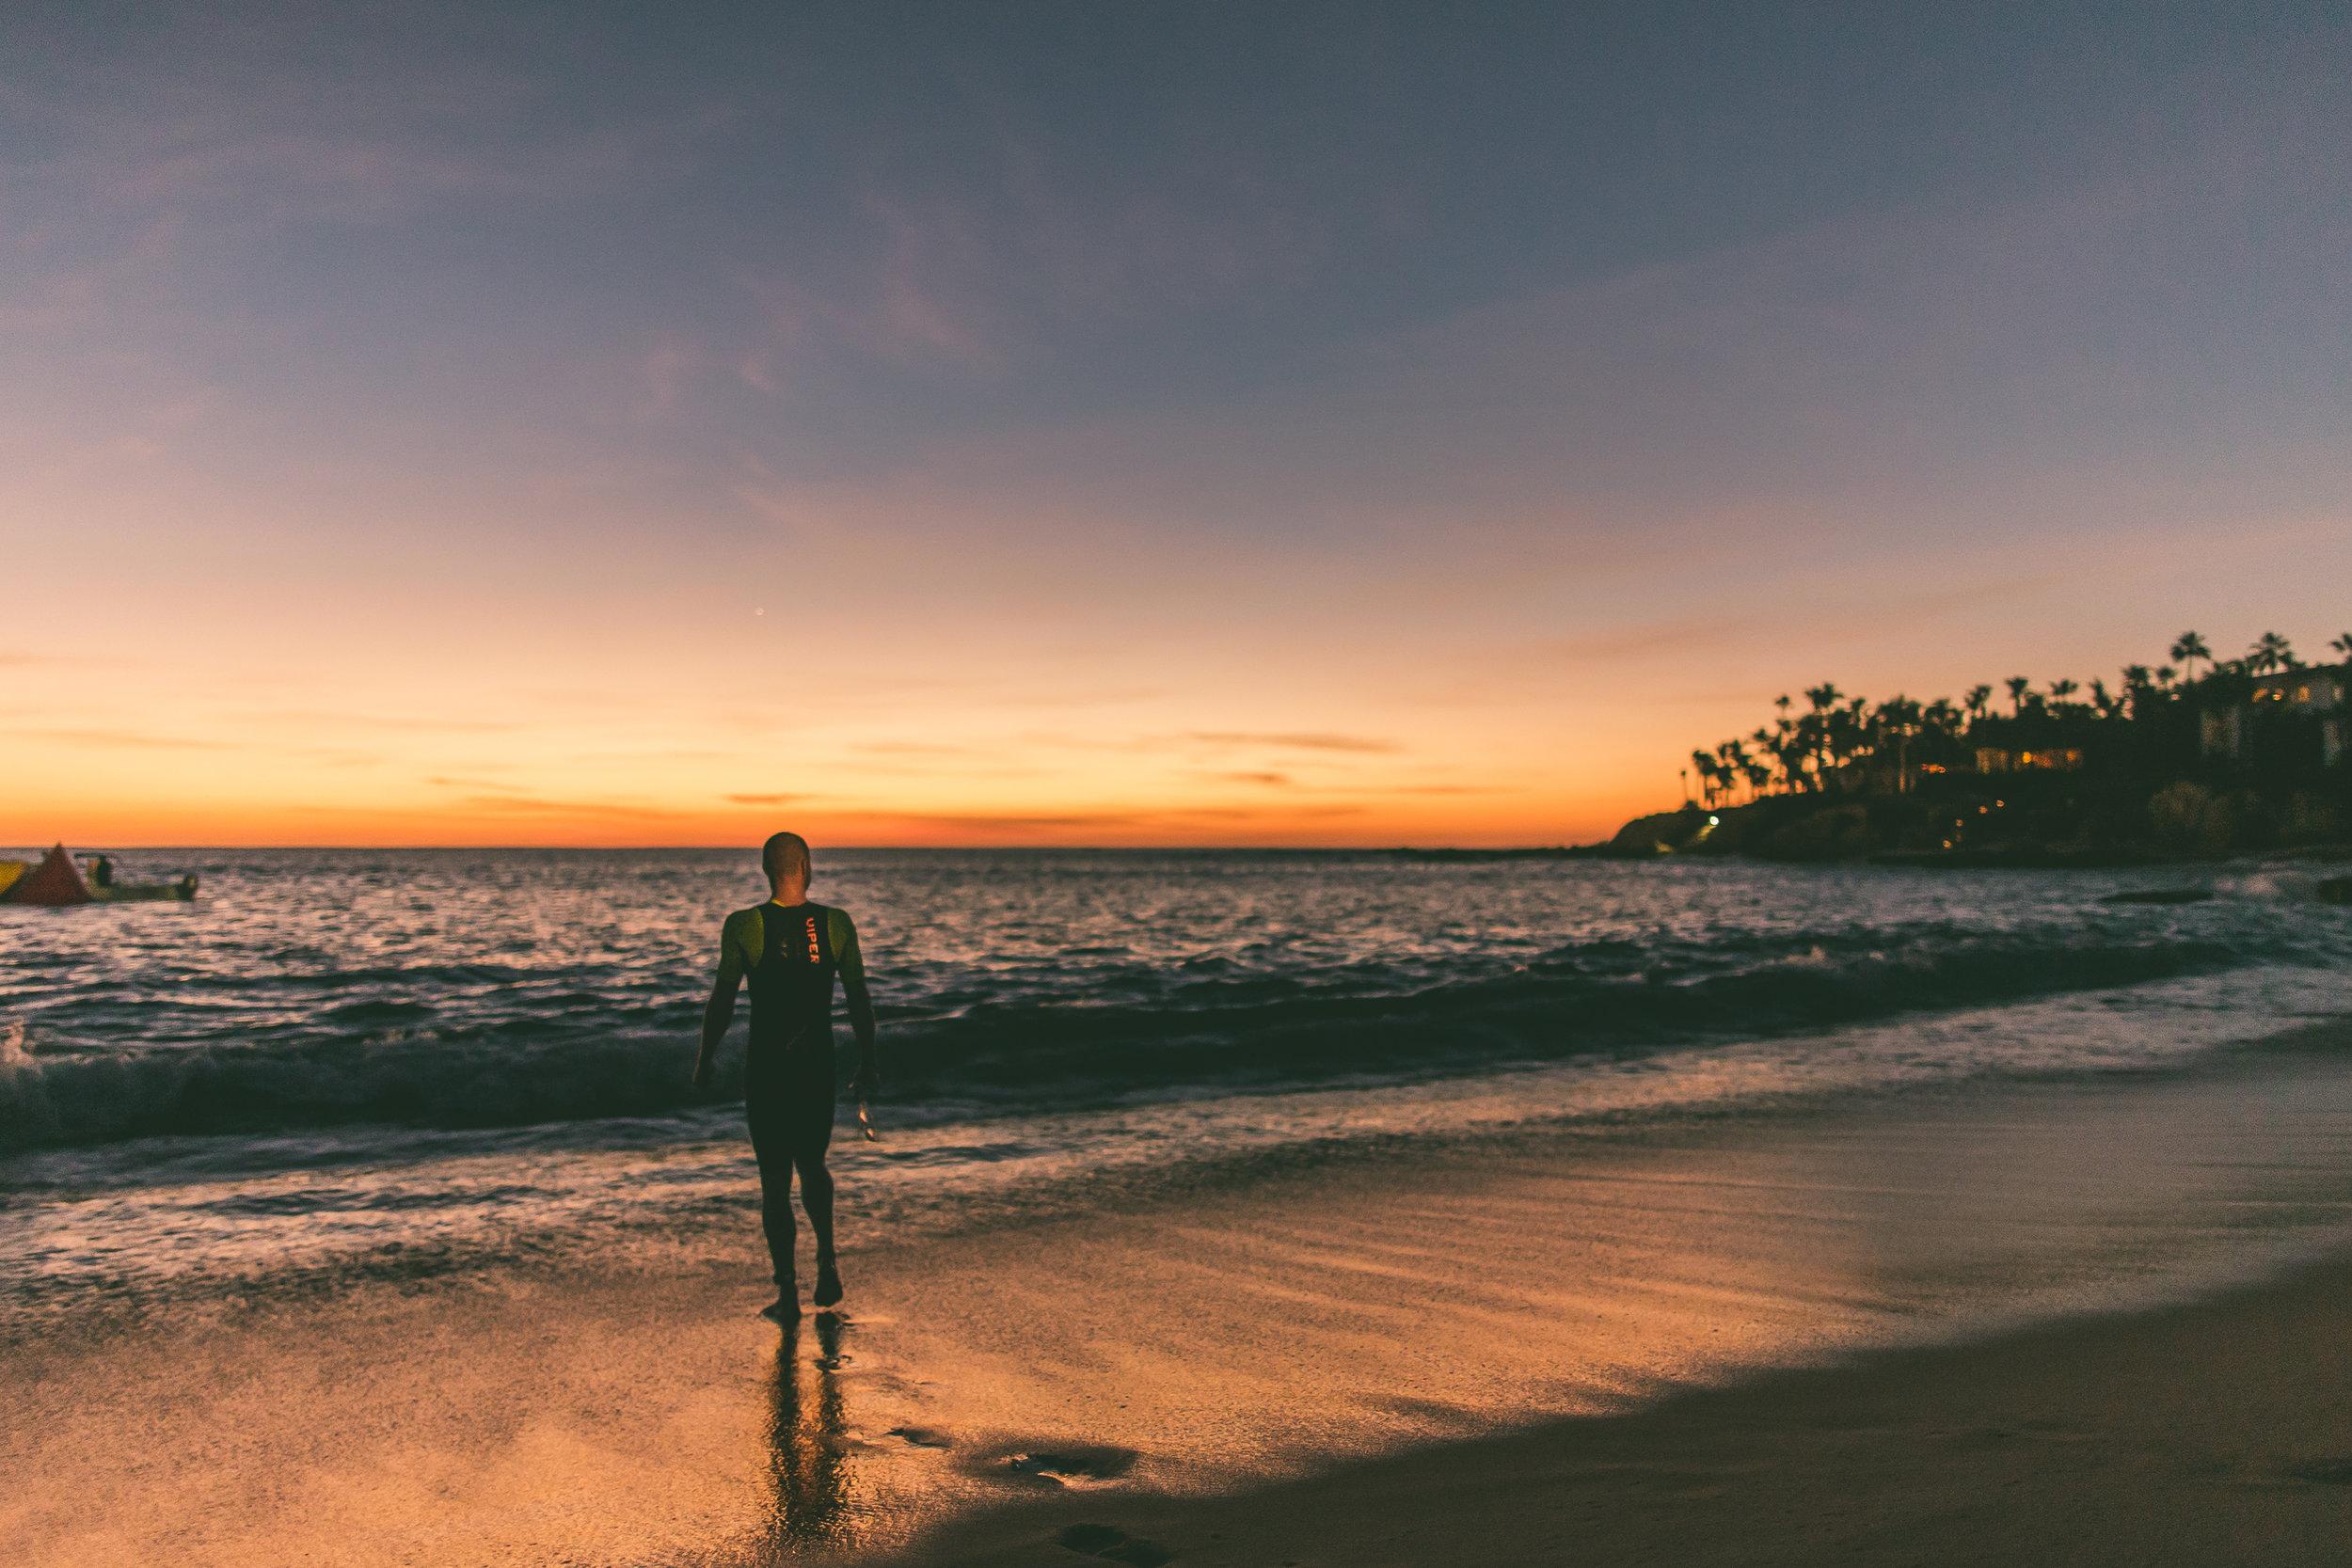 Luke Mckenzie at the waters edge on sunrise.